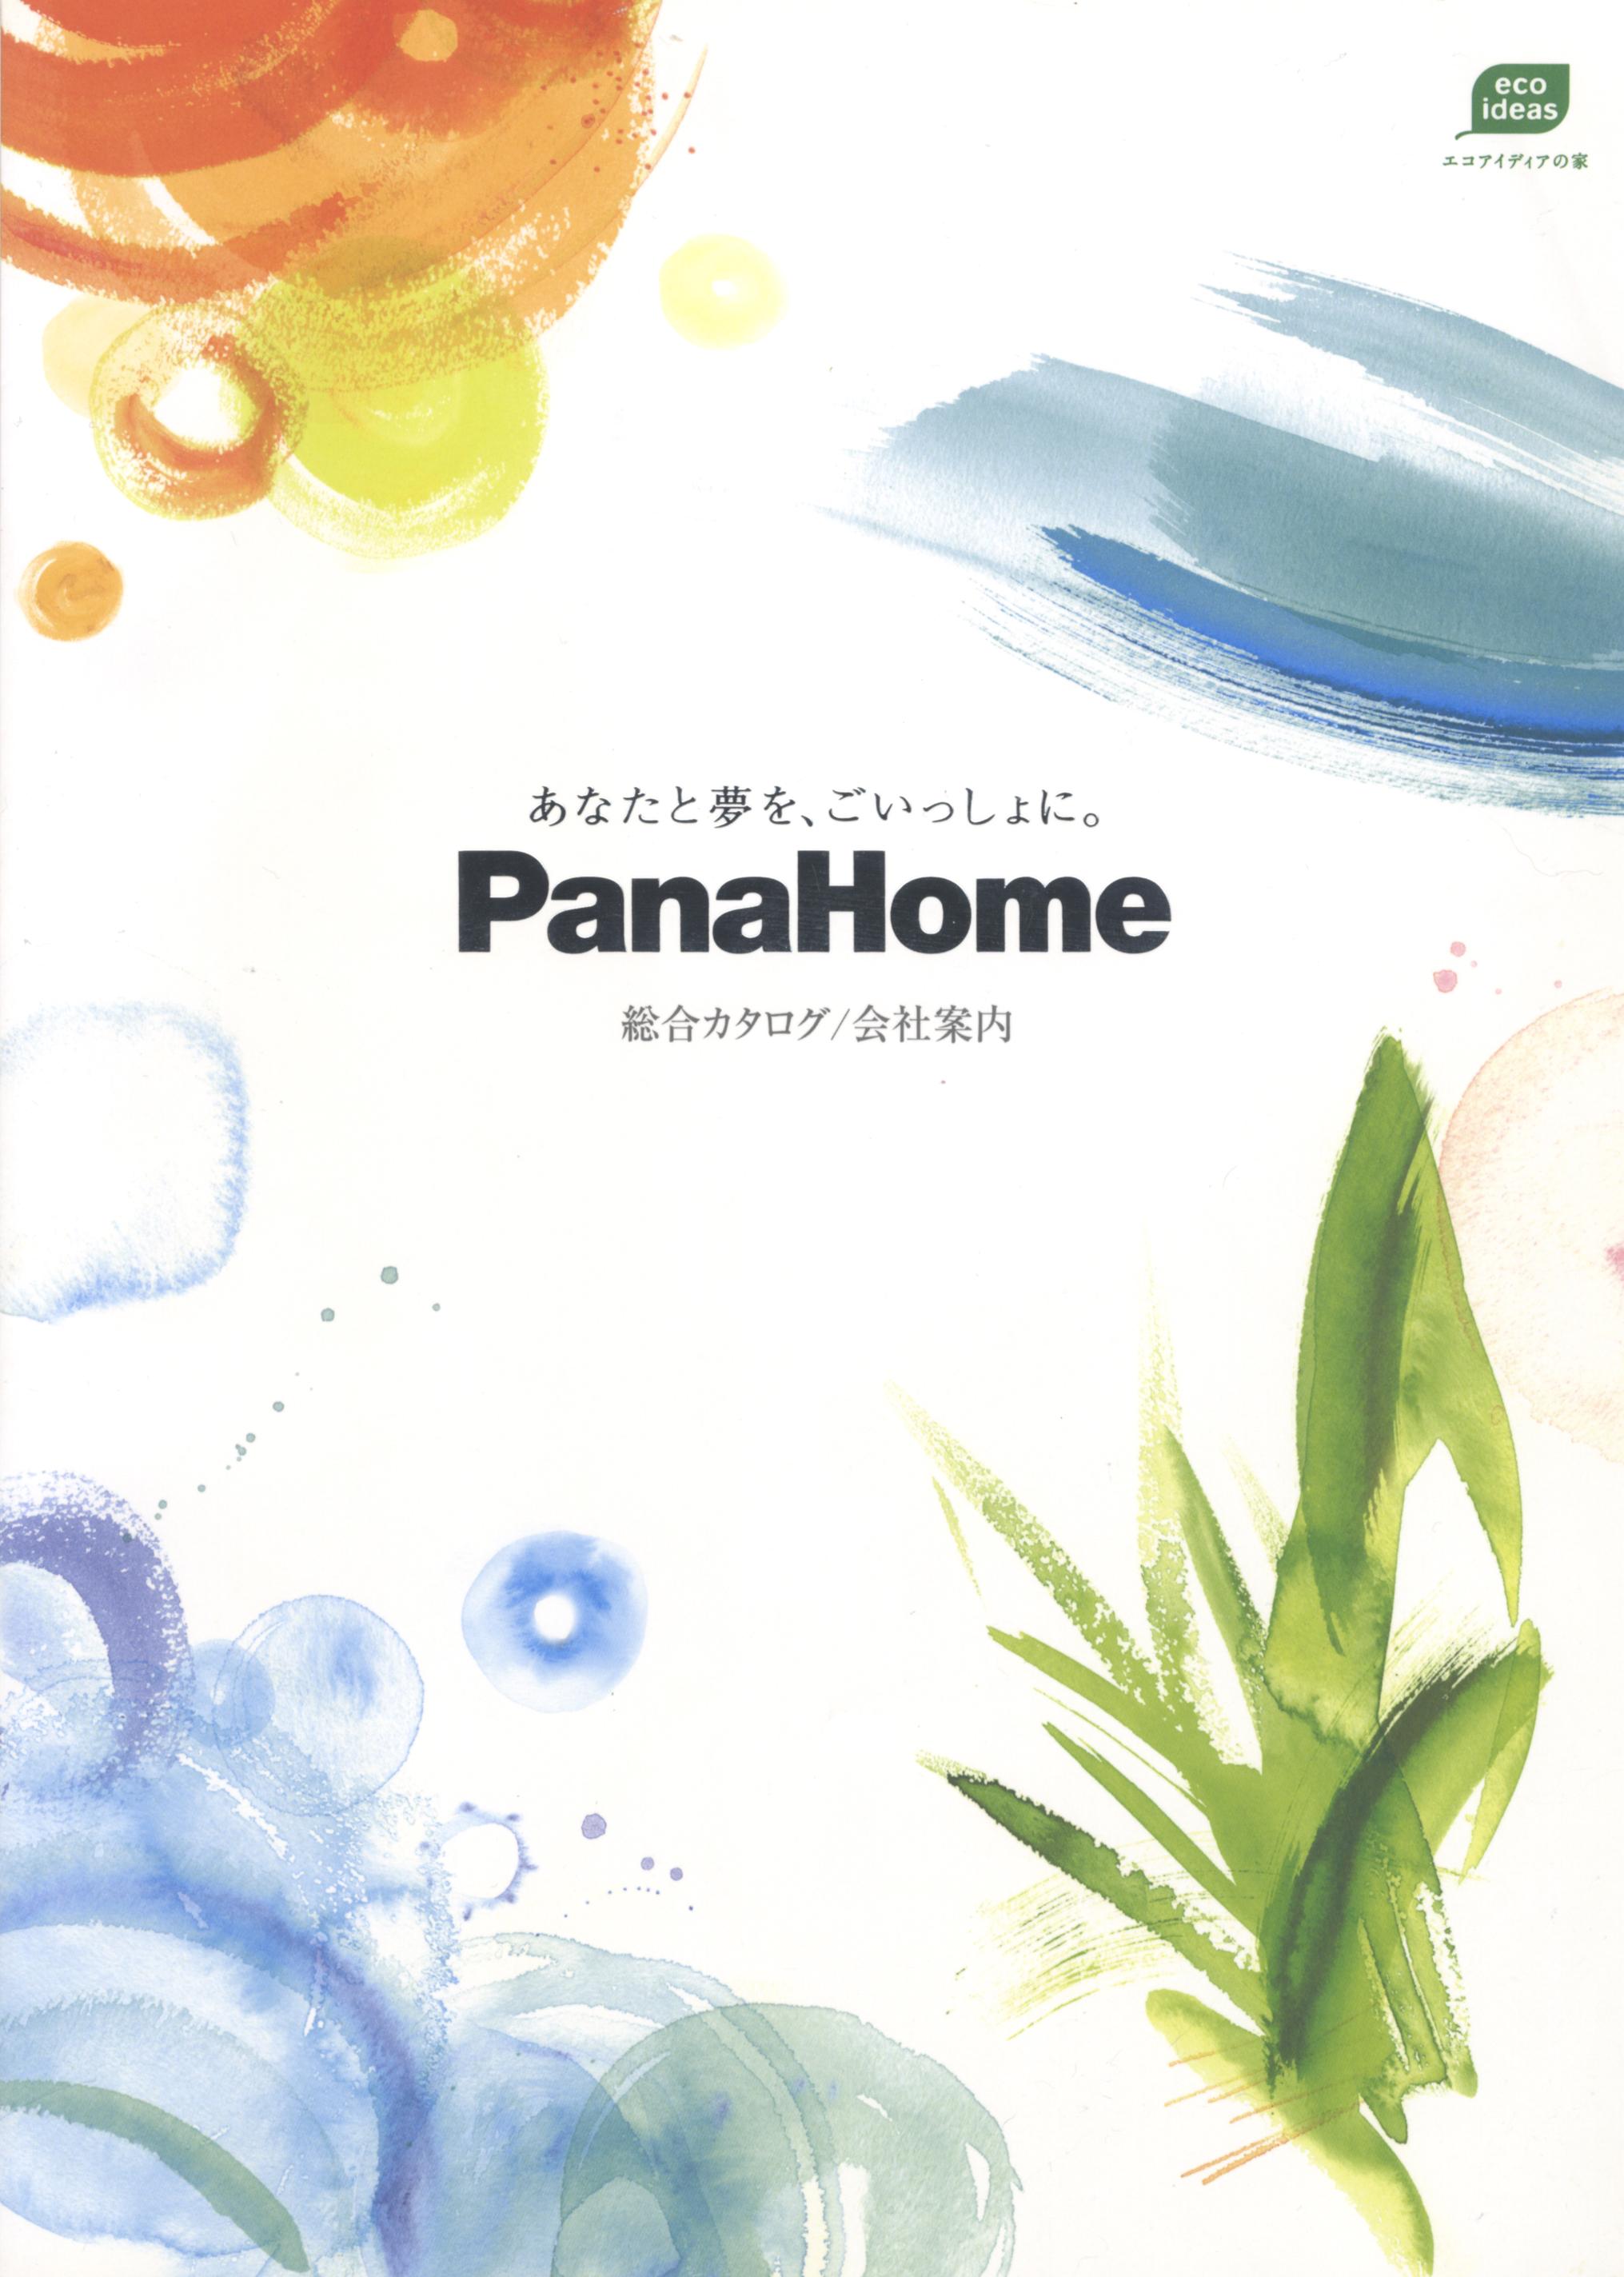 panahome